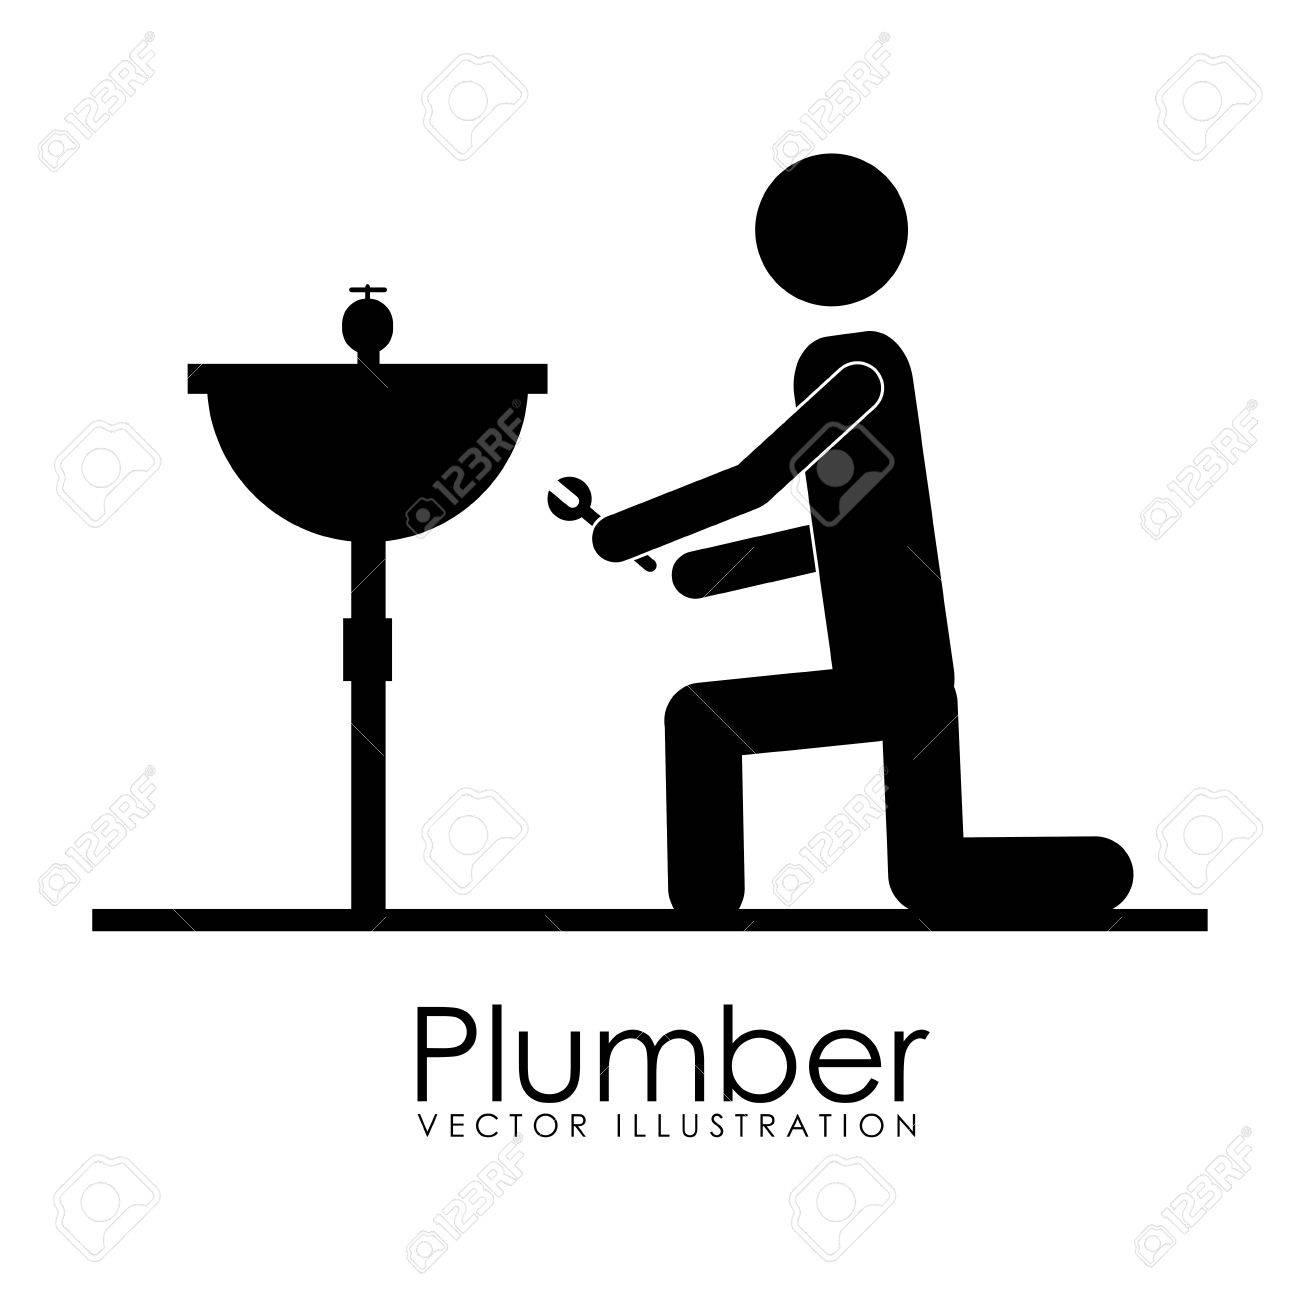 plumber icon over white background vector illustration Stock Vector - 21876598